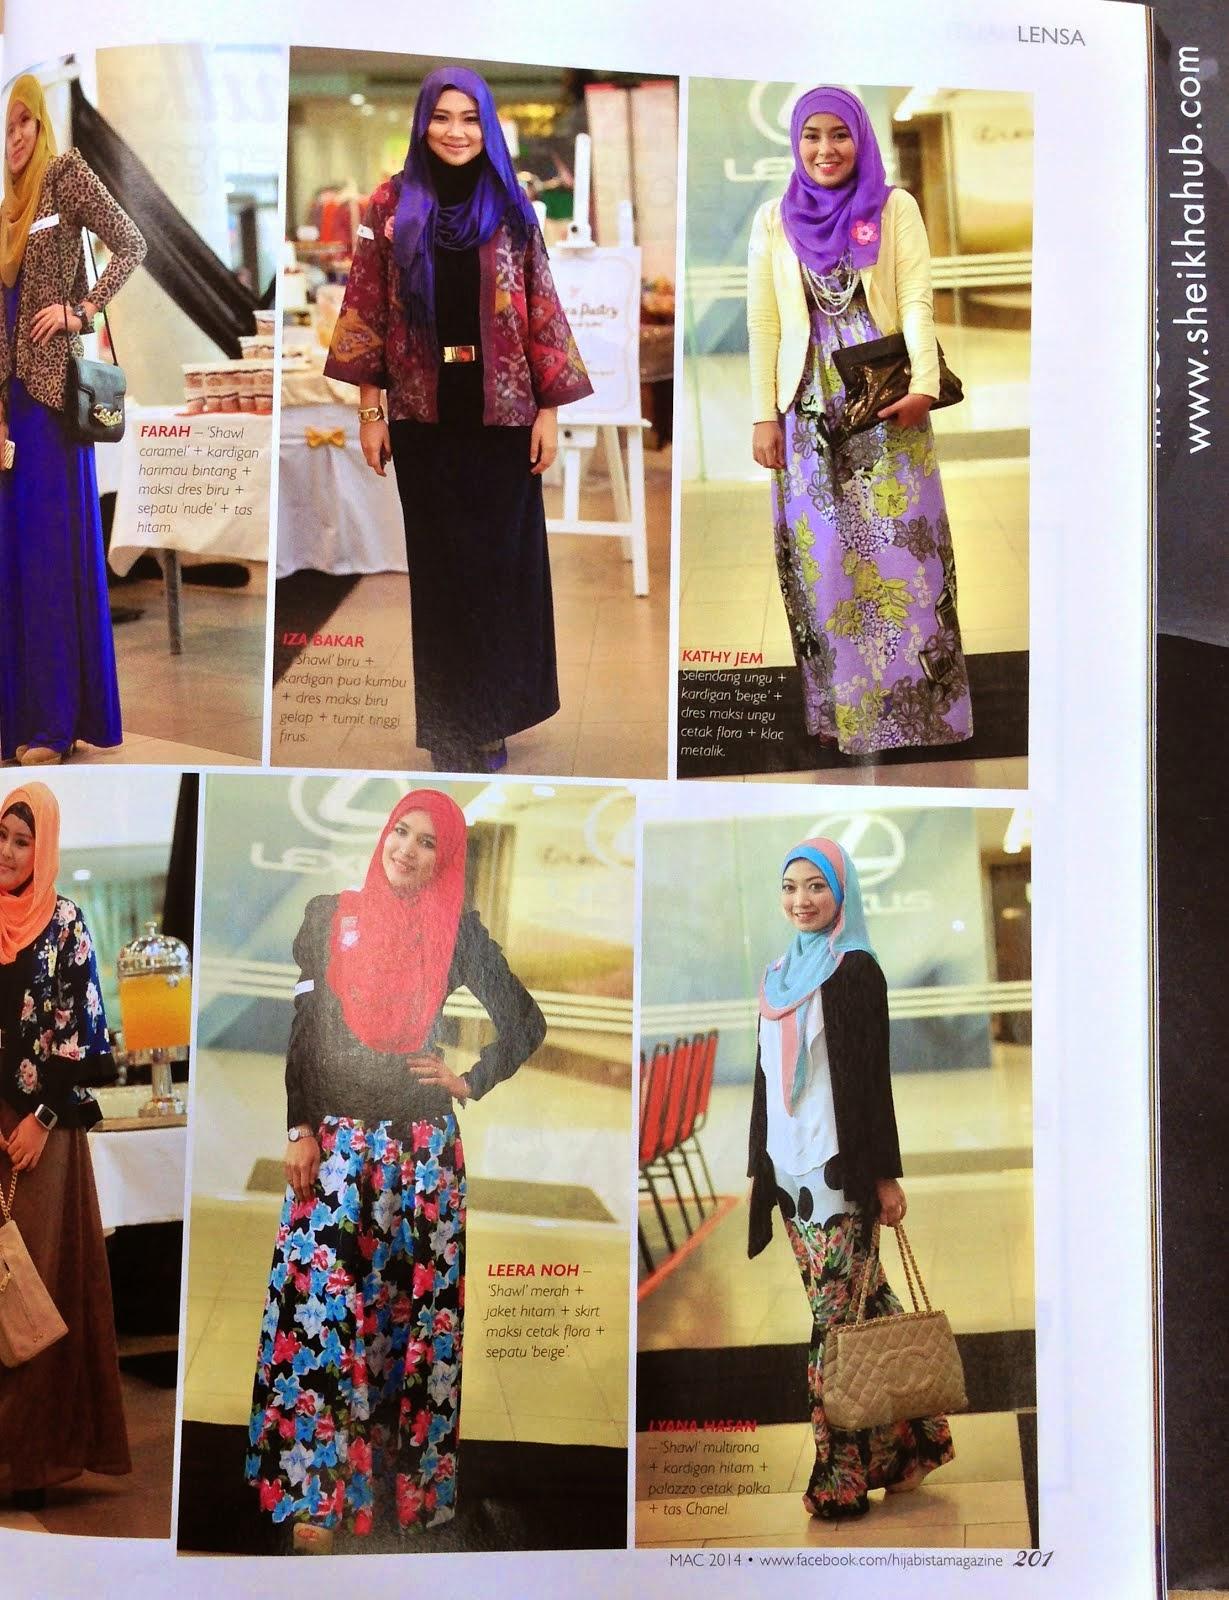 Hijabista Nona Mac 2014